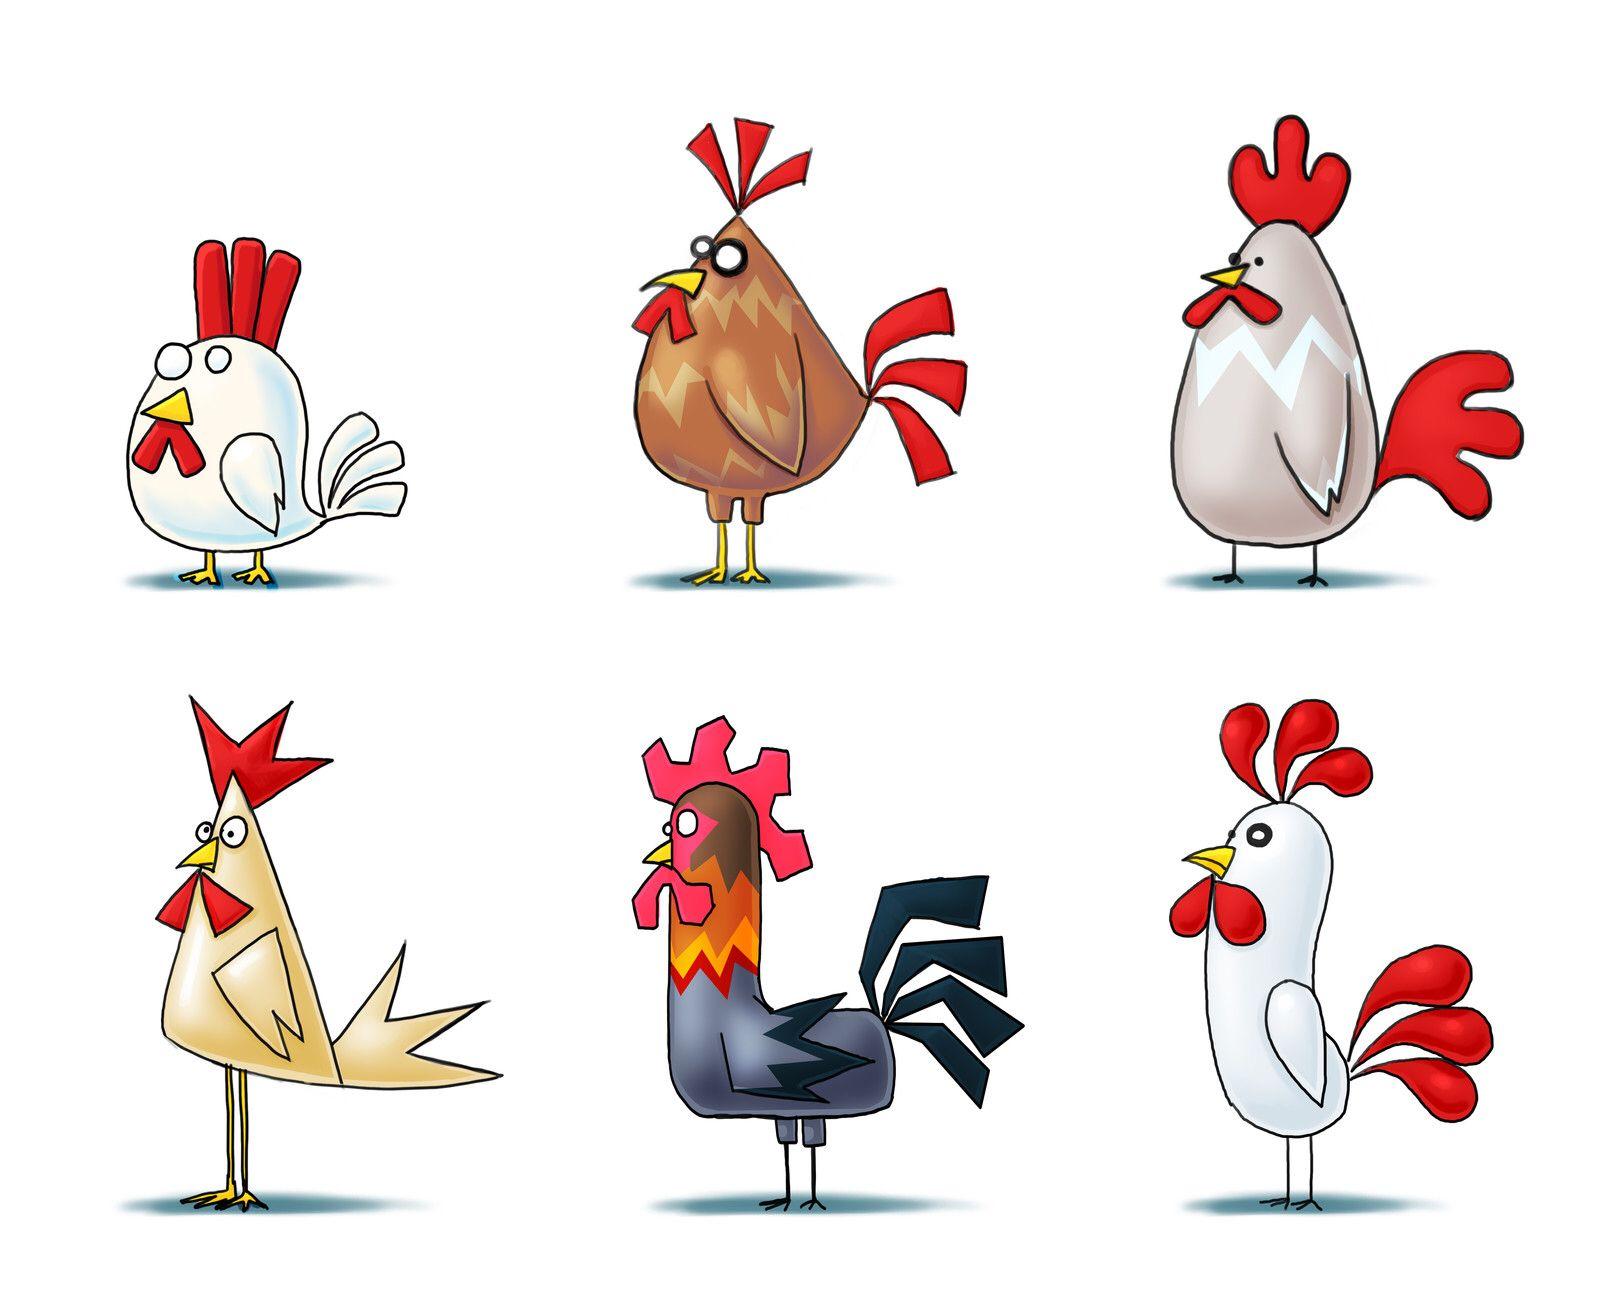 Share via artstation ios. Cage clipart chicken